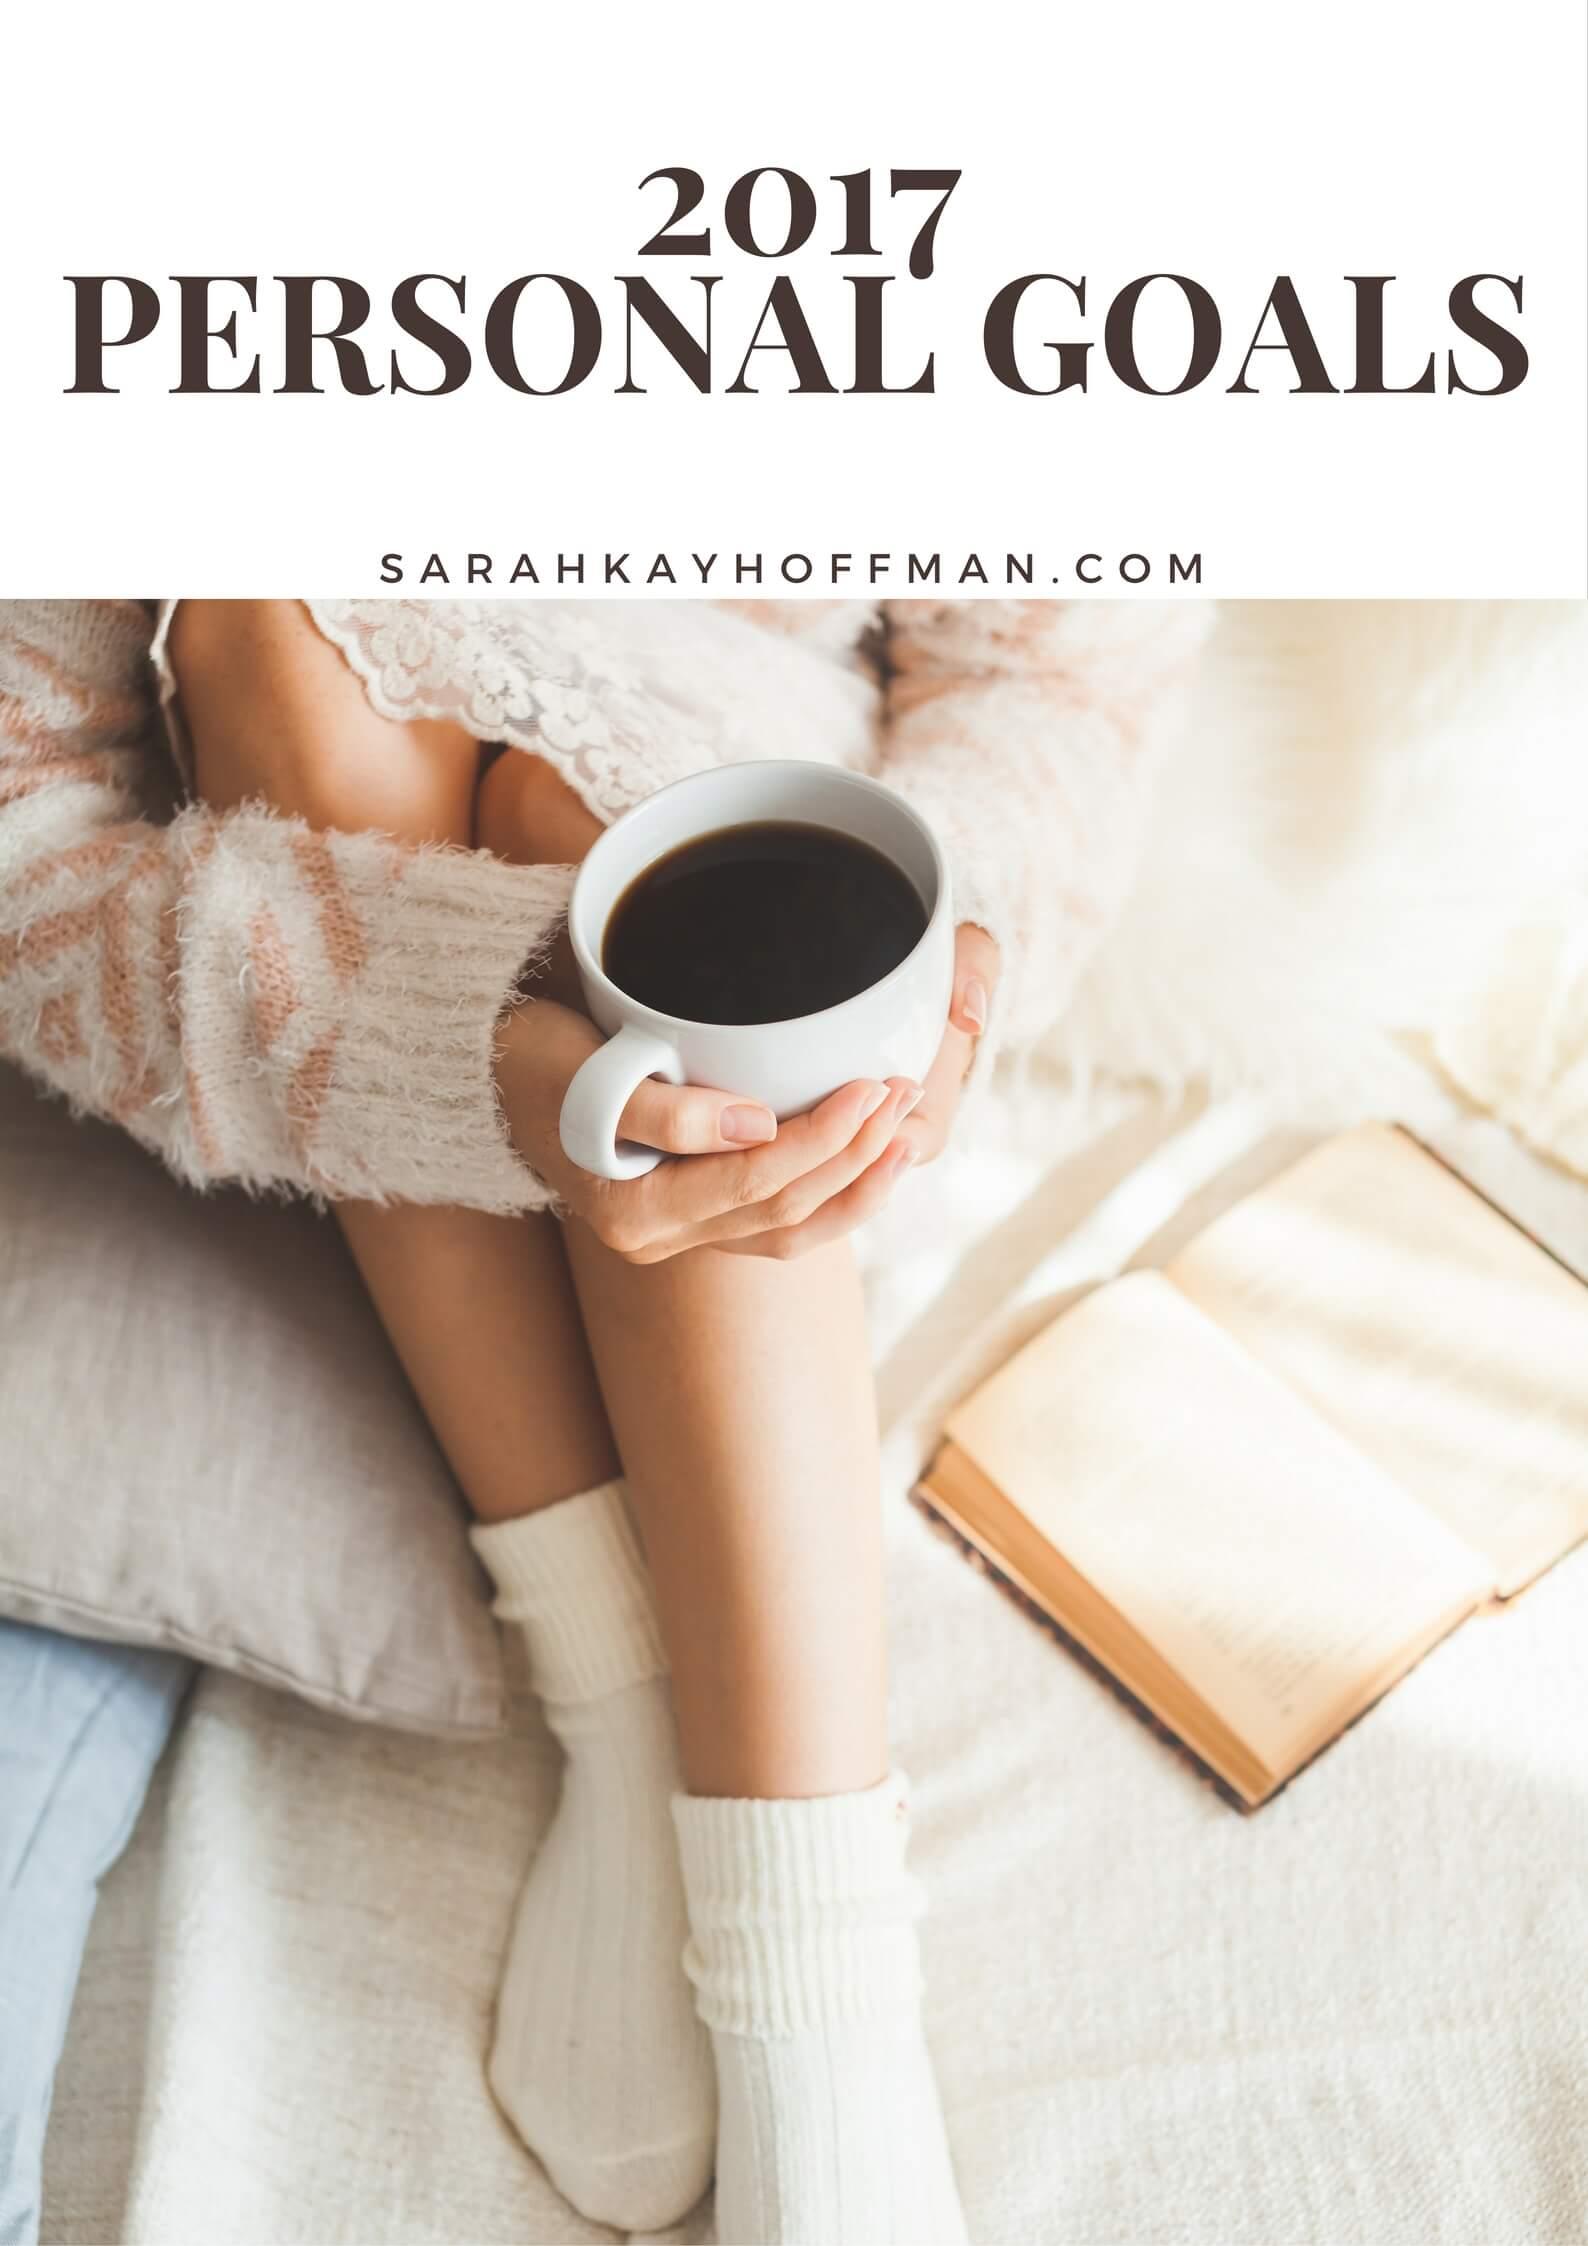 2017 Personal Goals New Year Goal sarahkayhoffman.com